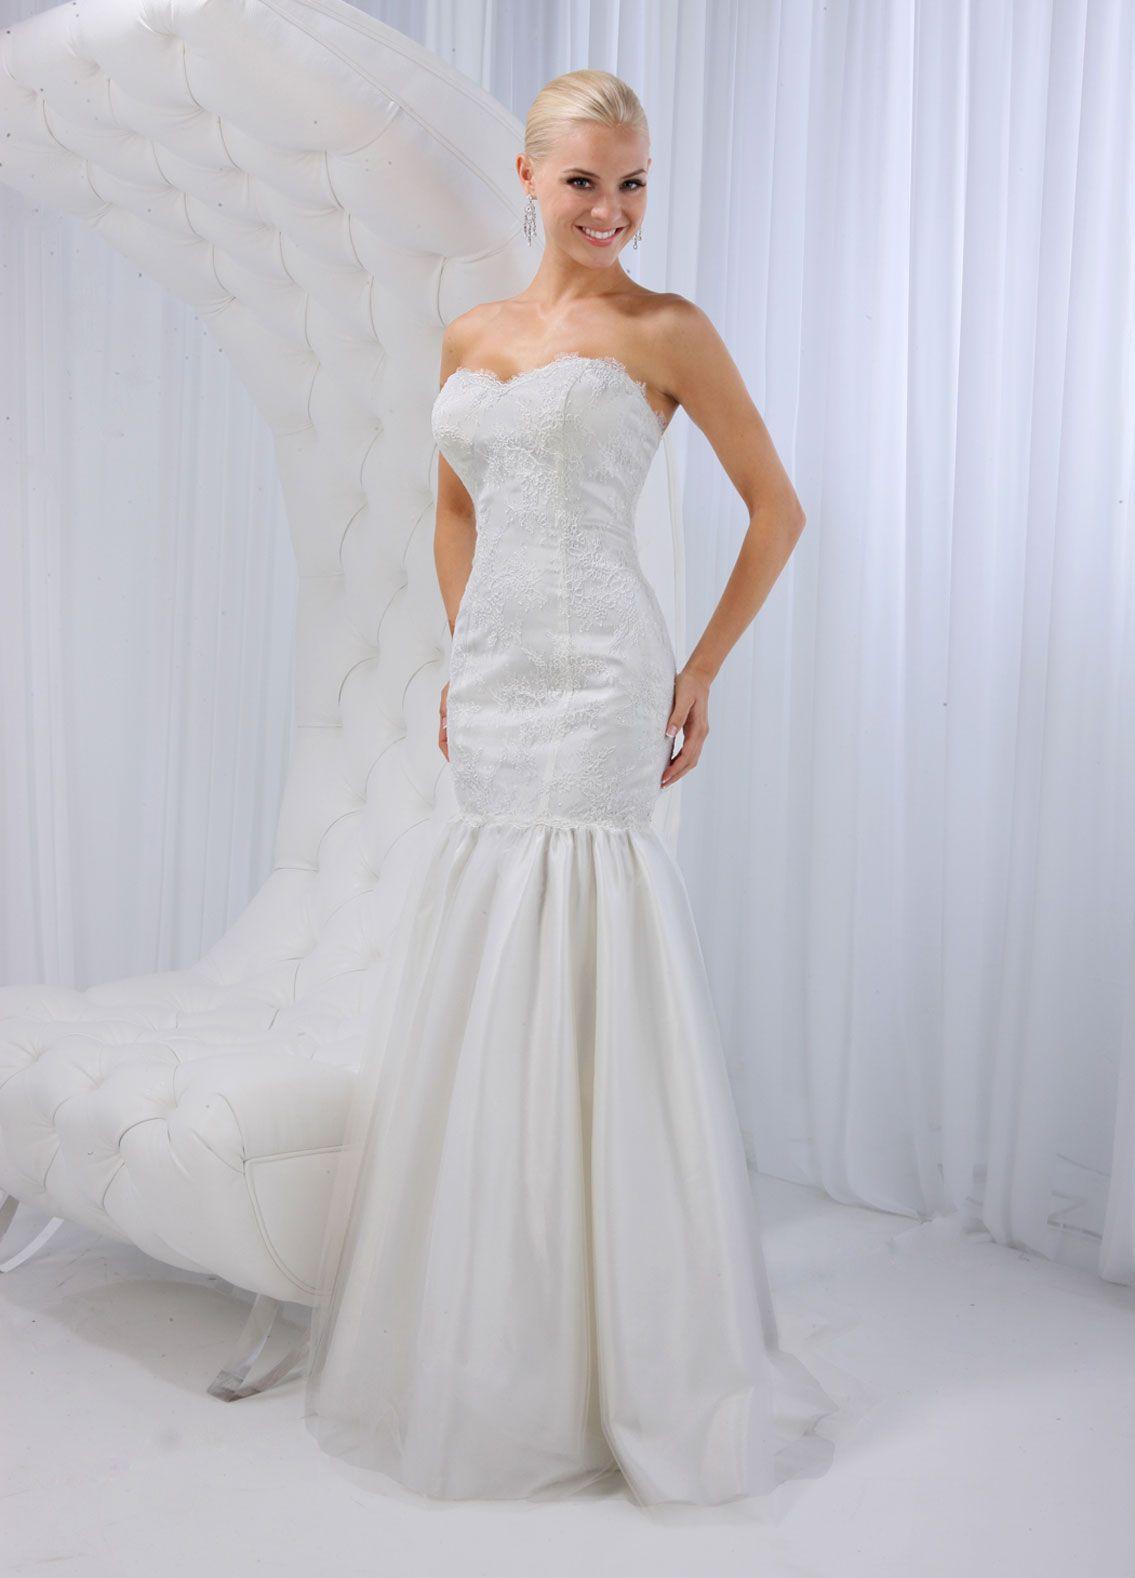 Wedding dresses tulsa  Impression Bridal Store  Find the perfect Wedding Dress Bridesmaid